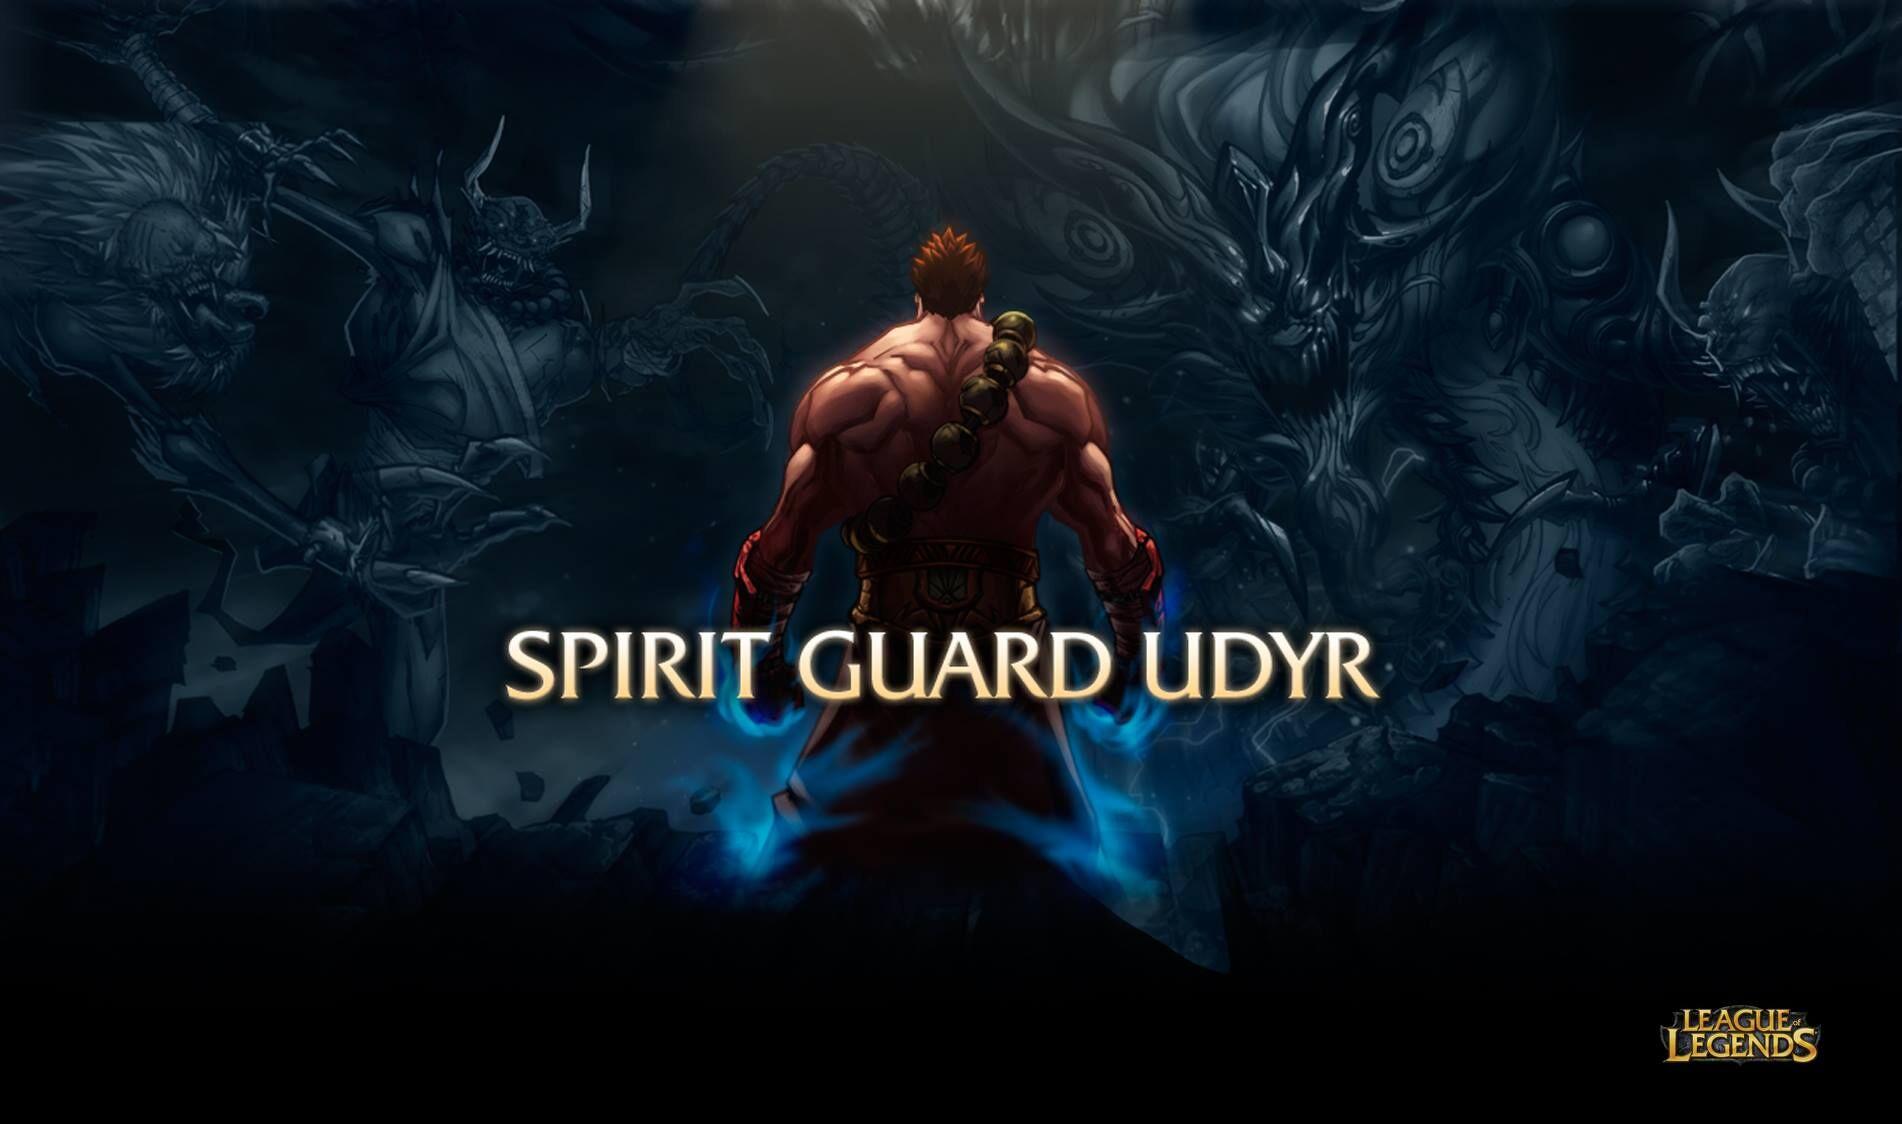 Udyr SpiritGuard Comic Cover 01.jpg